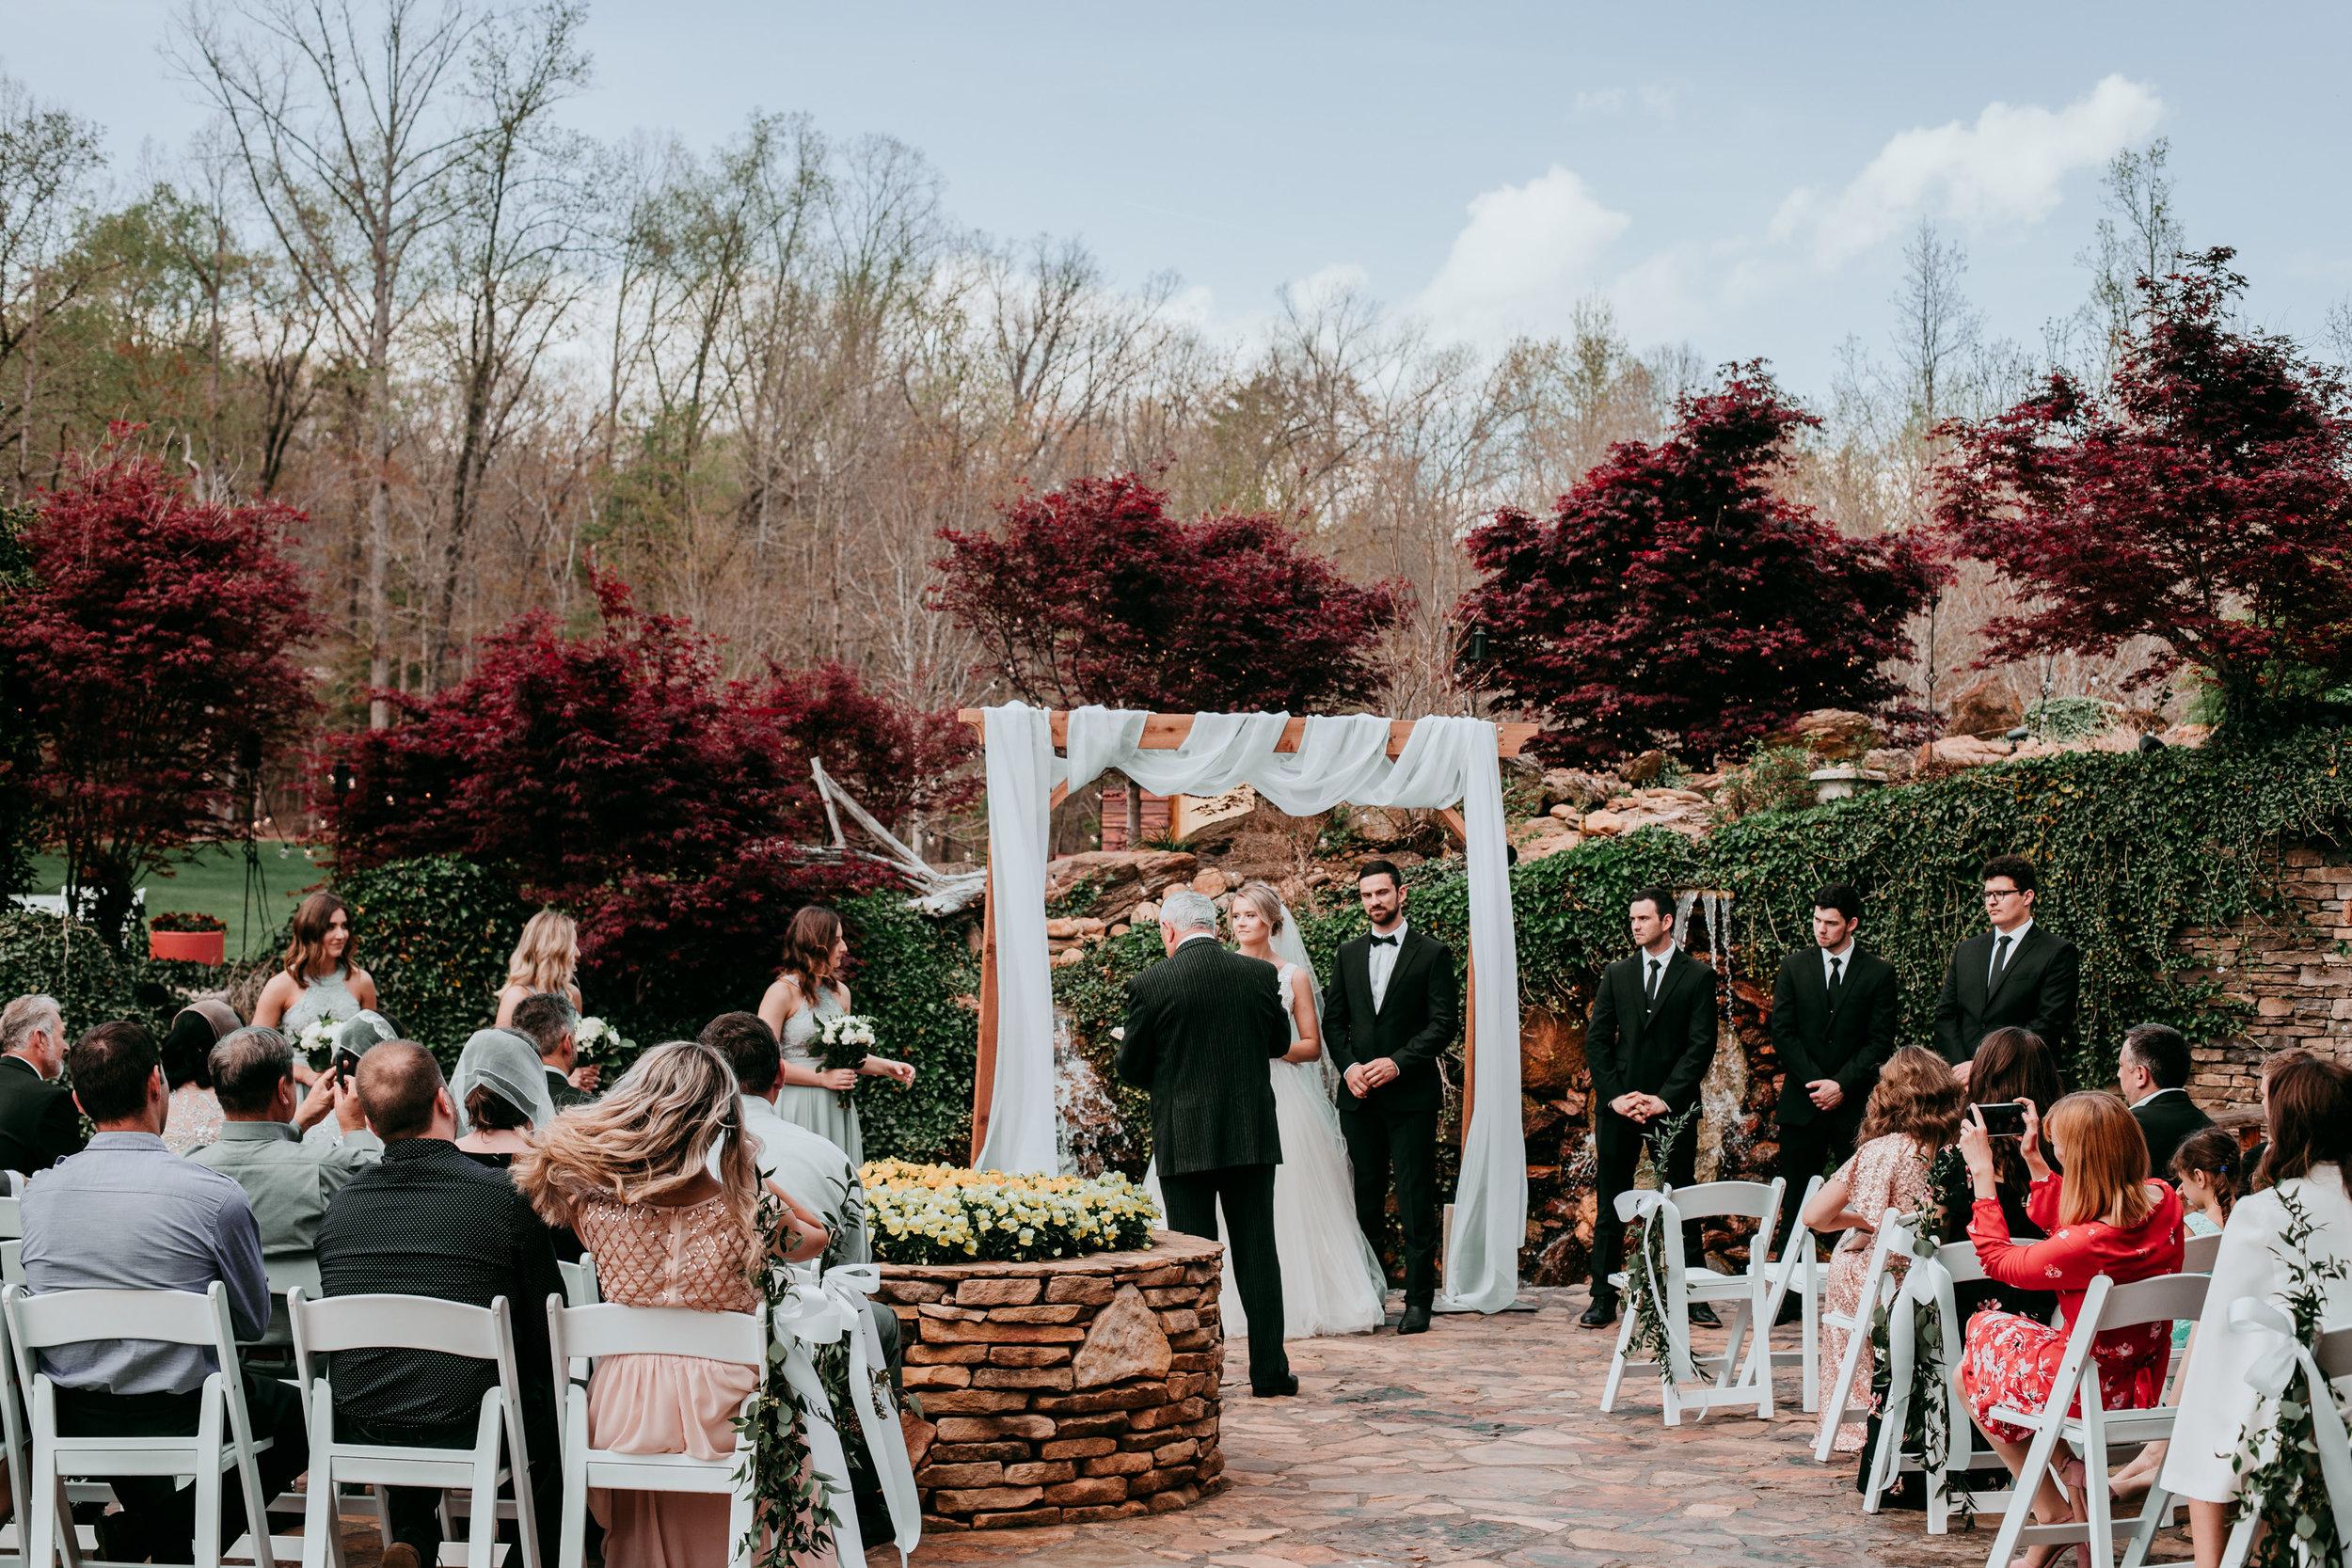 outdoor-wedding-ceremony-near-me.jpg